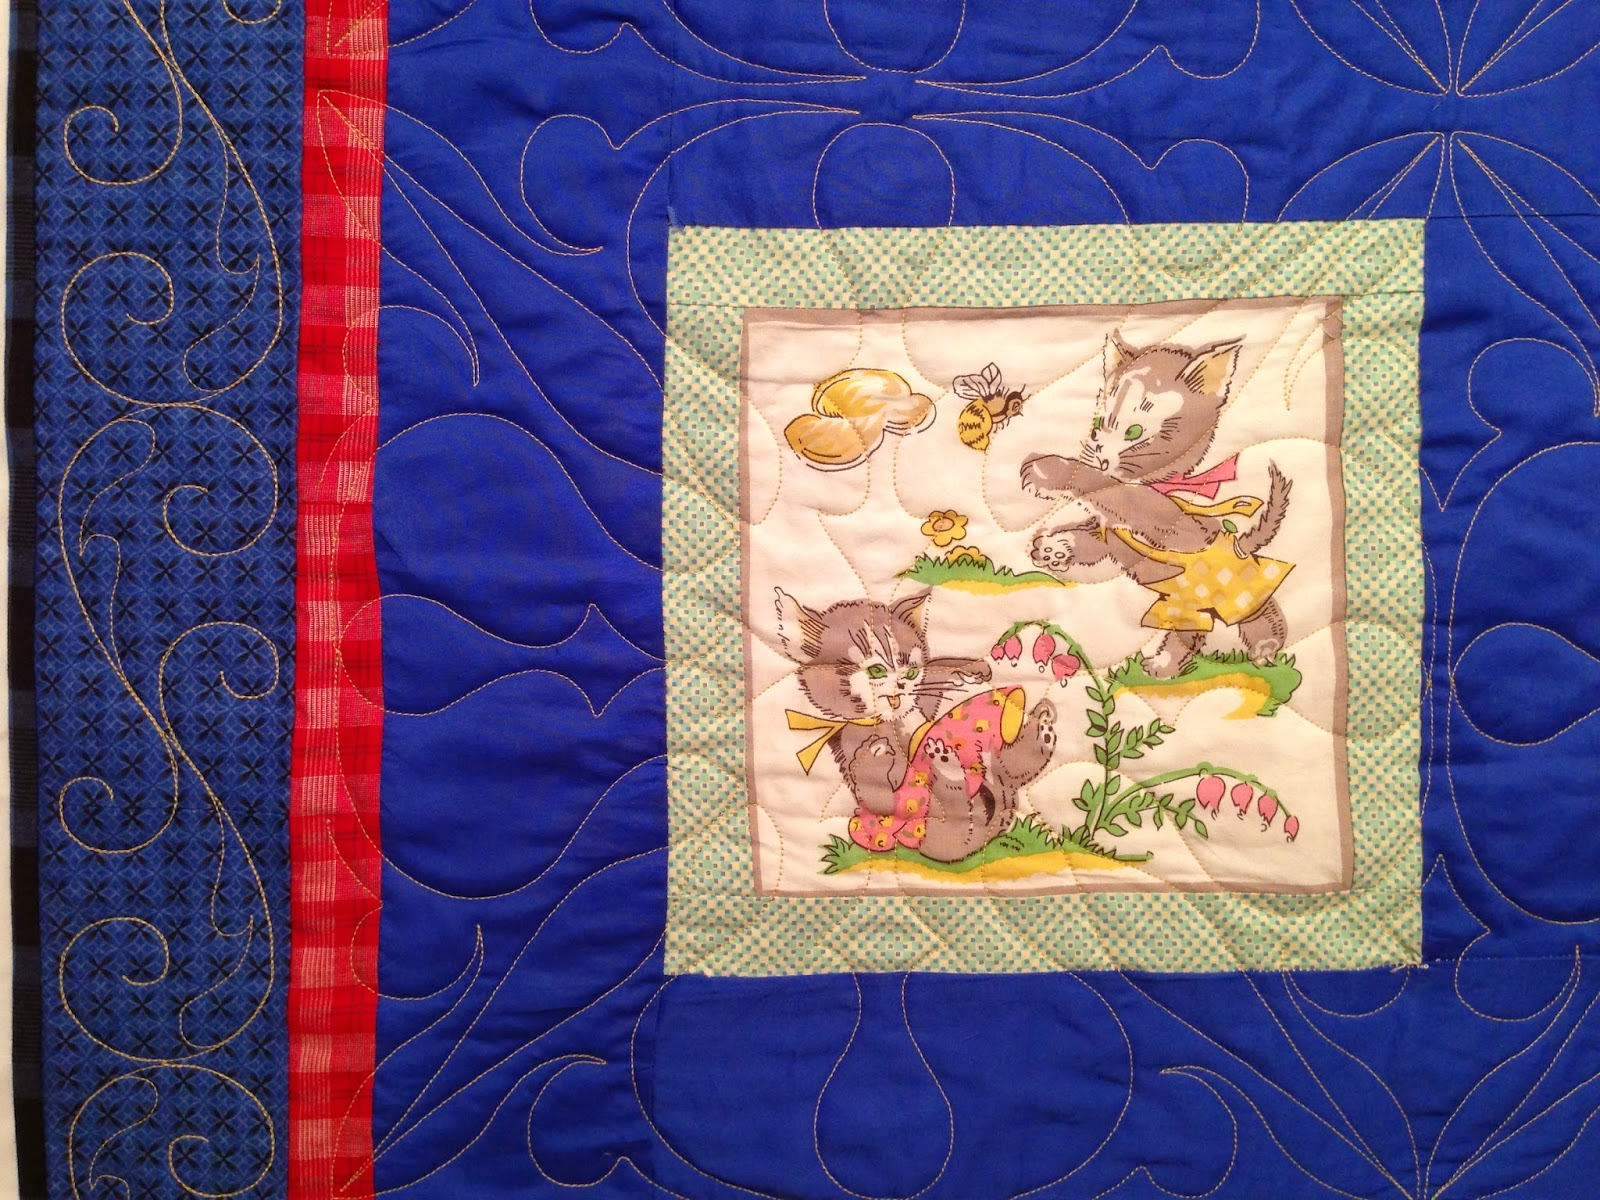 Paula Bergstrand's Blue Block Quilt